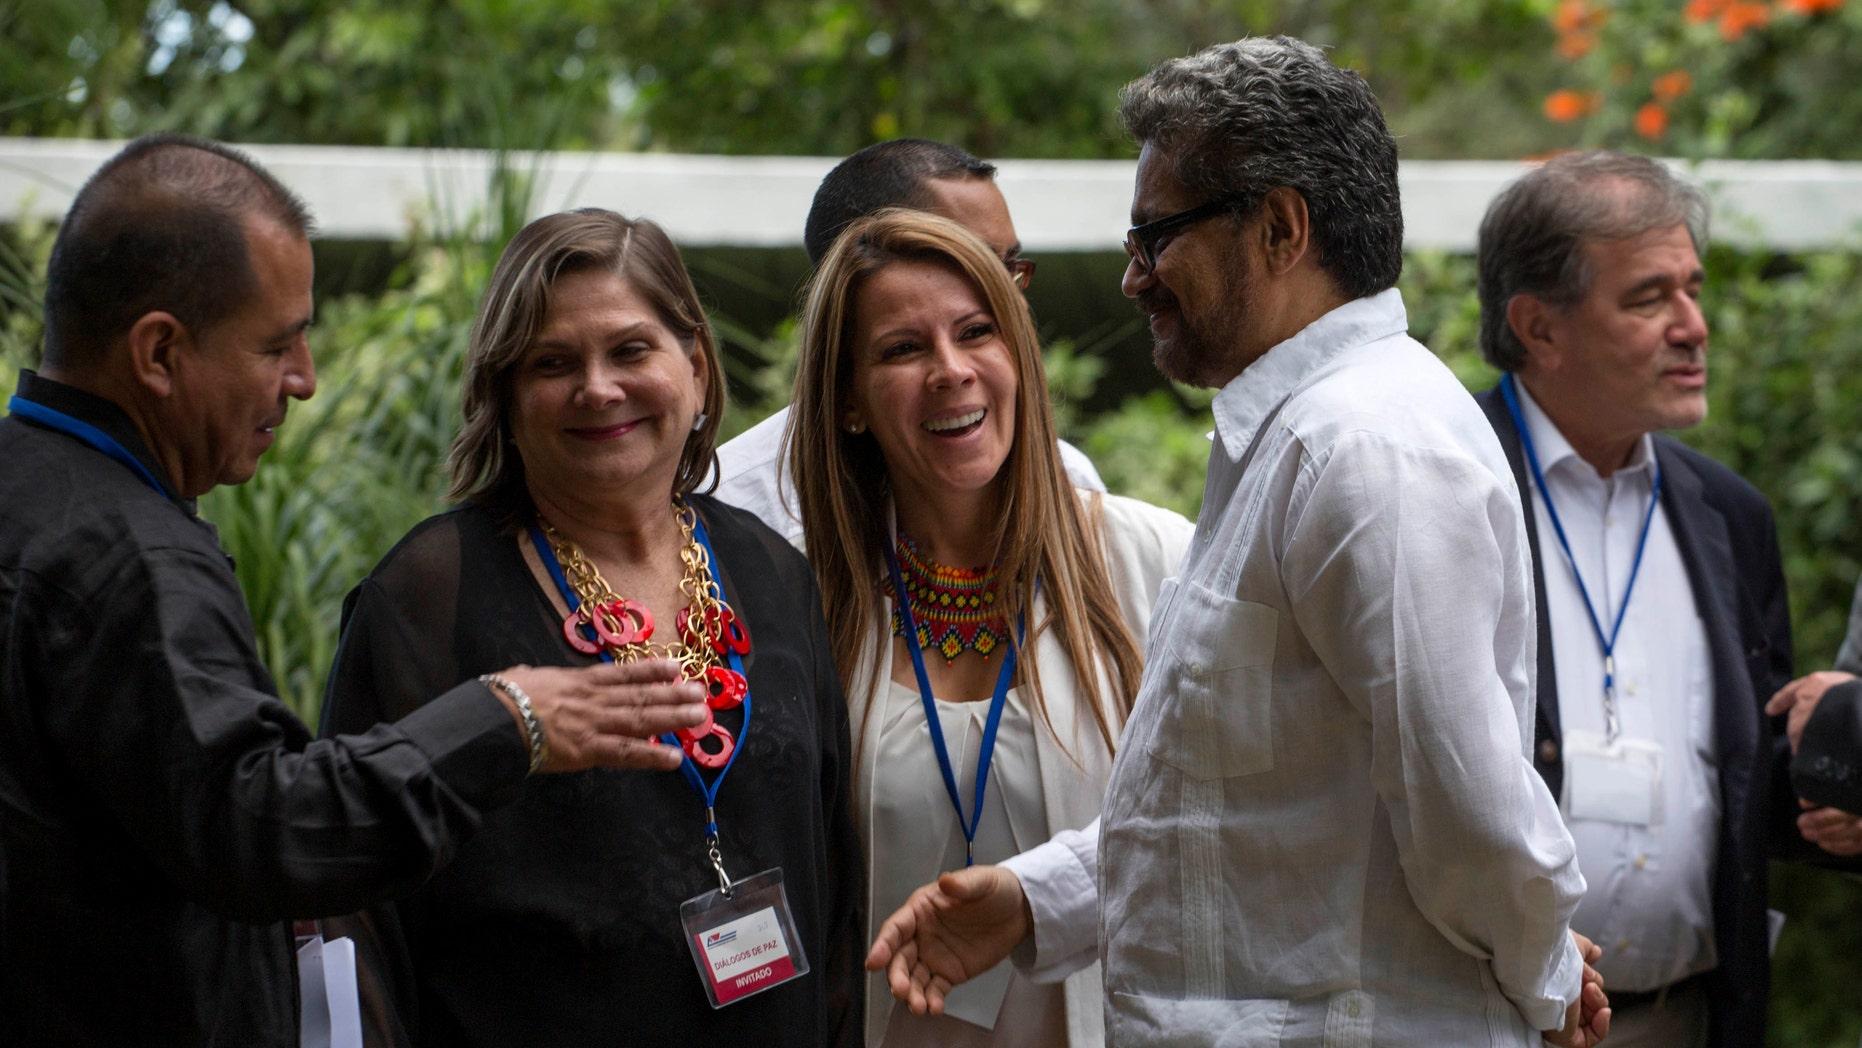 Ivan Marquez, FARC's chief negotiator, meets with representatives of victims in Havana, Cuba, on Dec. 16, 2014.